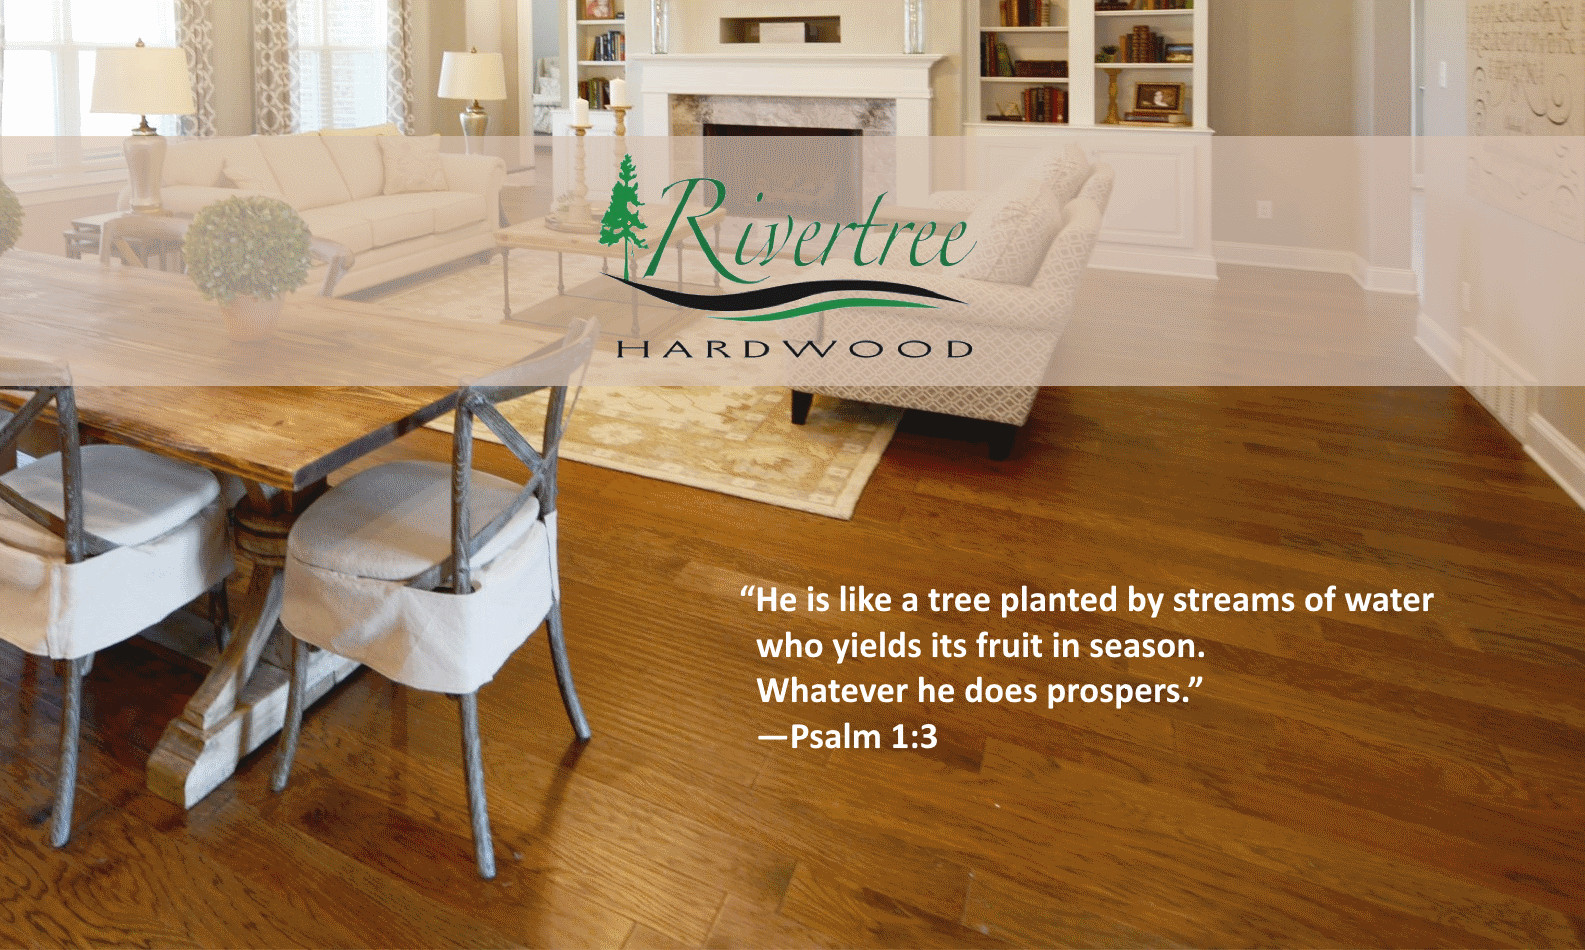 hardwood floor store inc of rivertree hardwood inc pertaining to sliderpix1